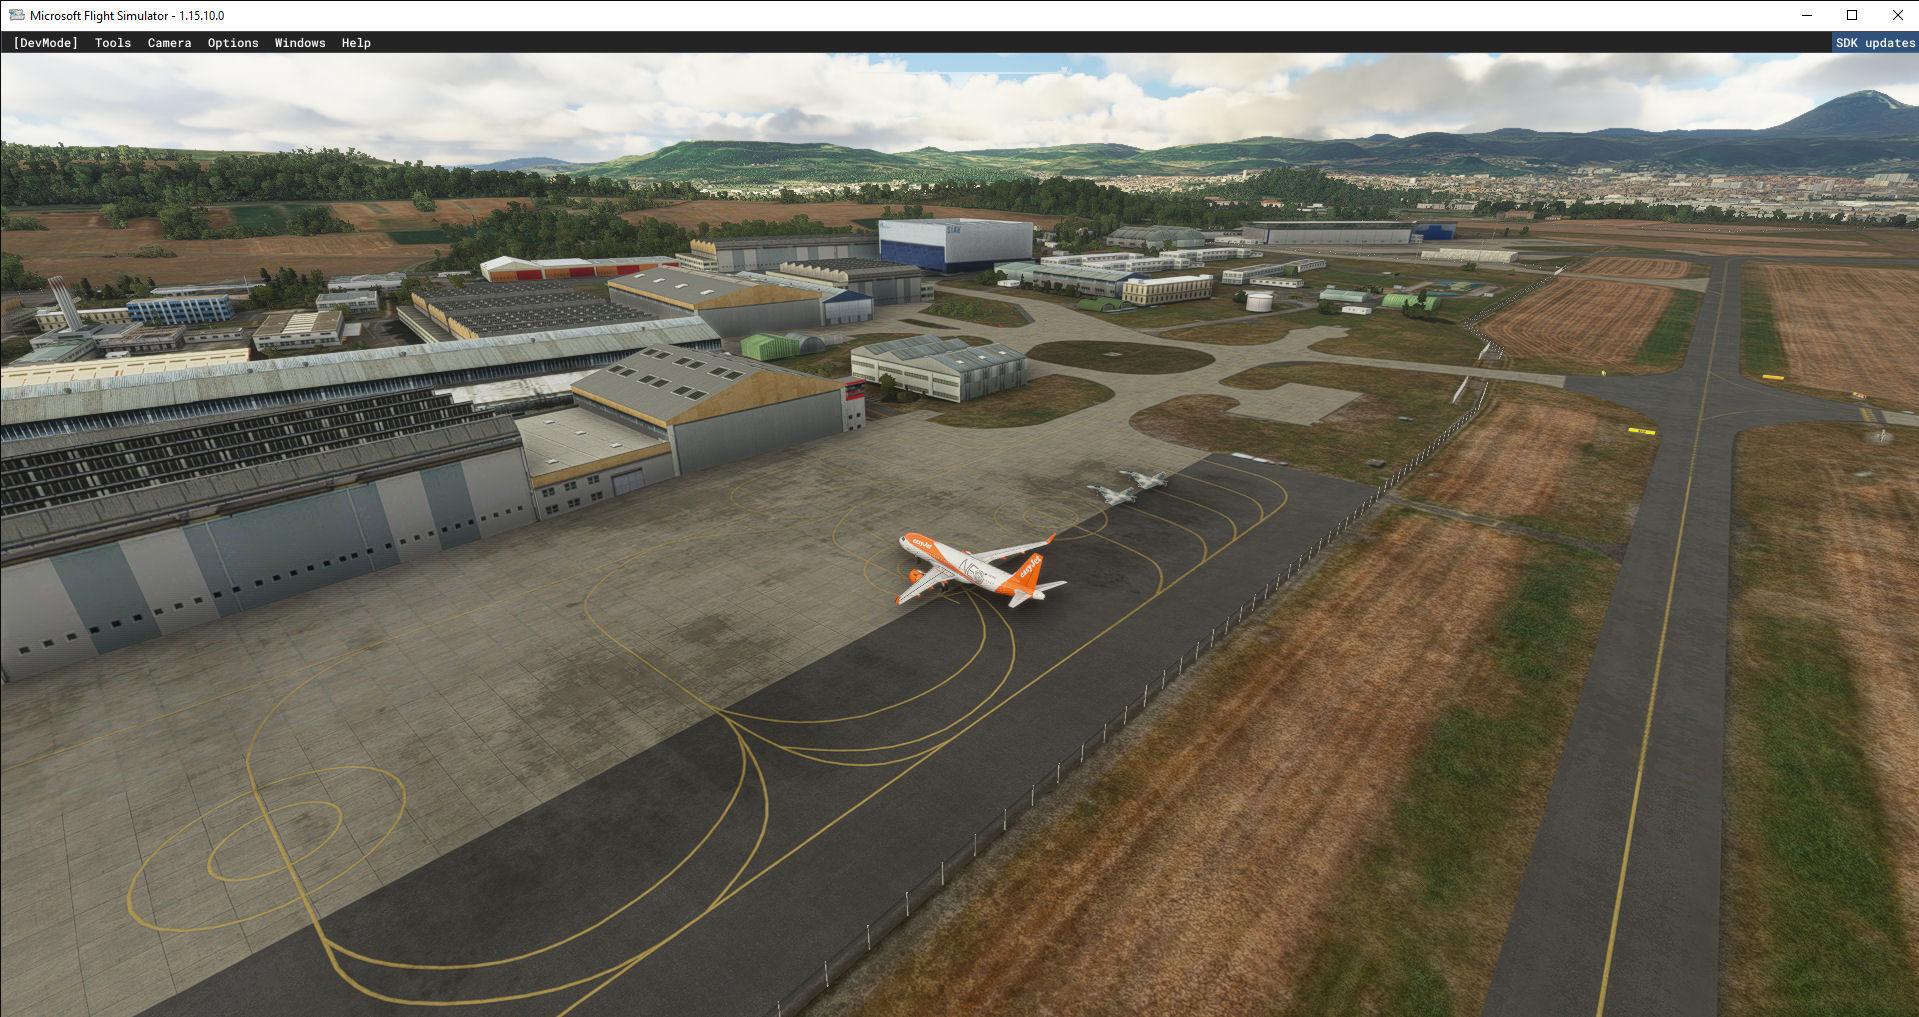 AIRPORT FRANCE Pack #1 pour MSFS disponible  Microsoft-Flight-Simulator-08-05-2021-09-17-55